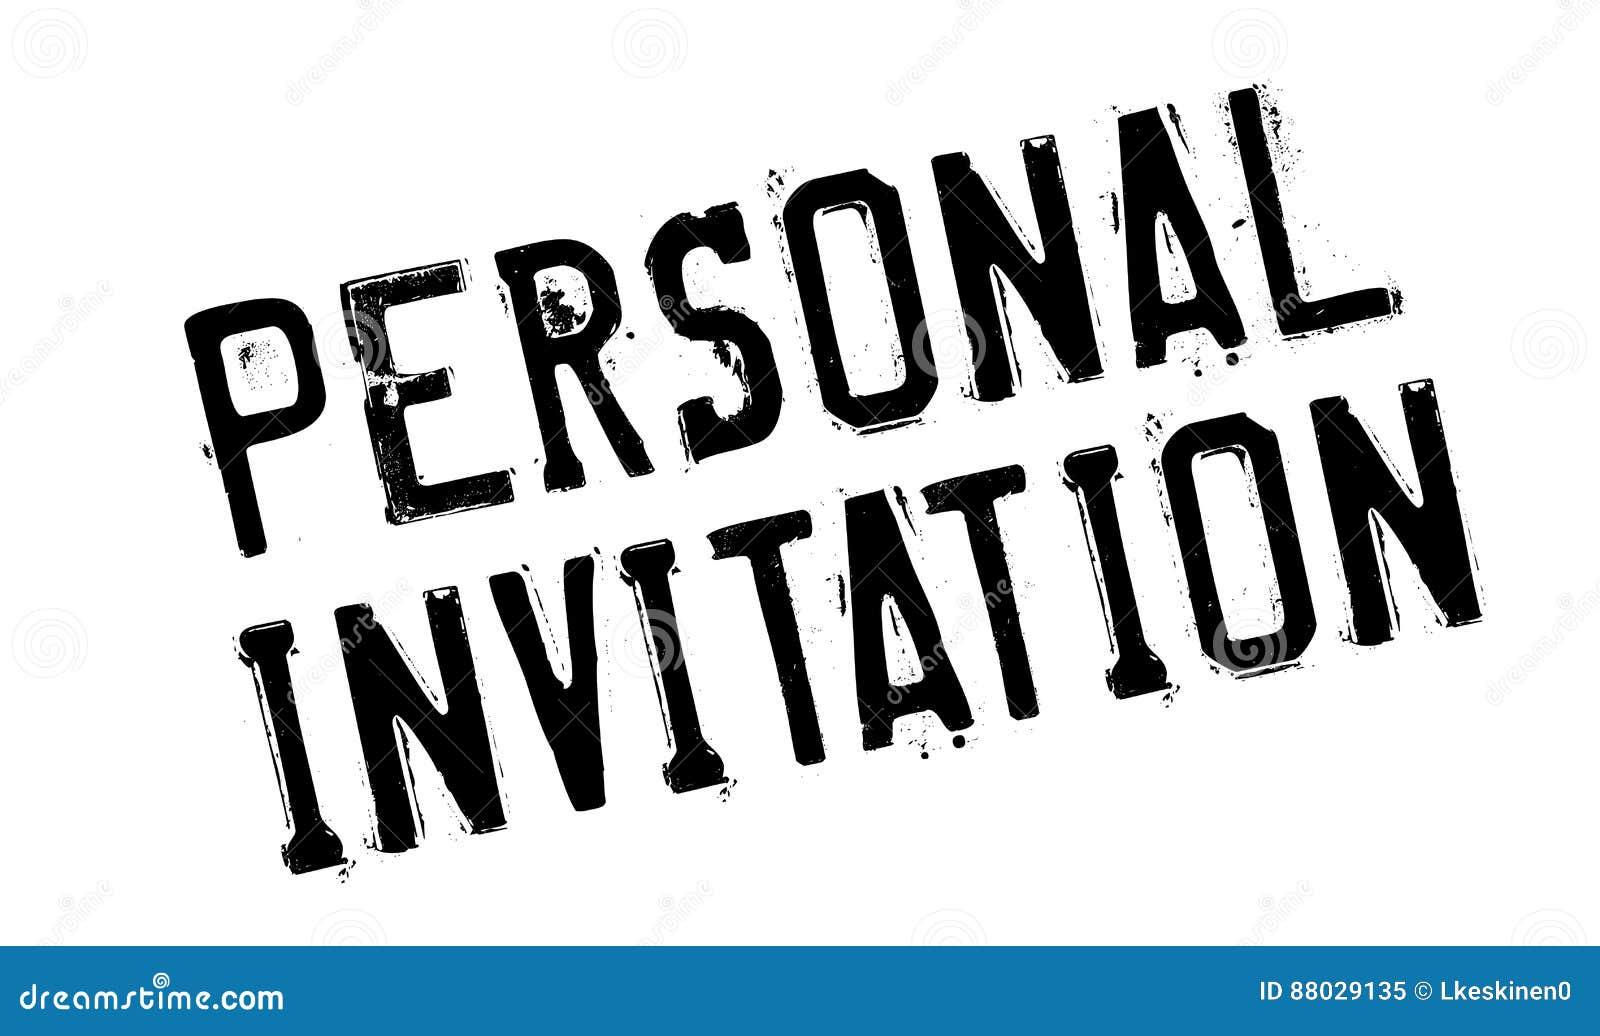 personal invitation rubber stamp stock image image of invite